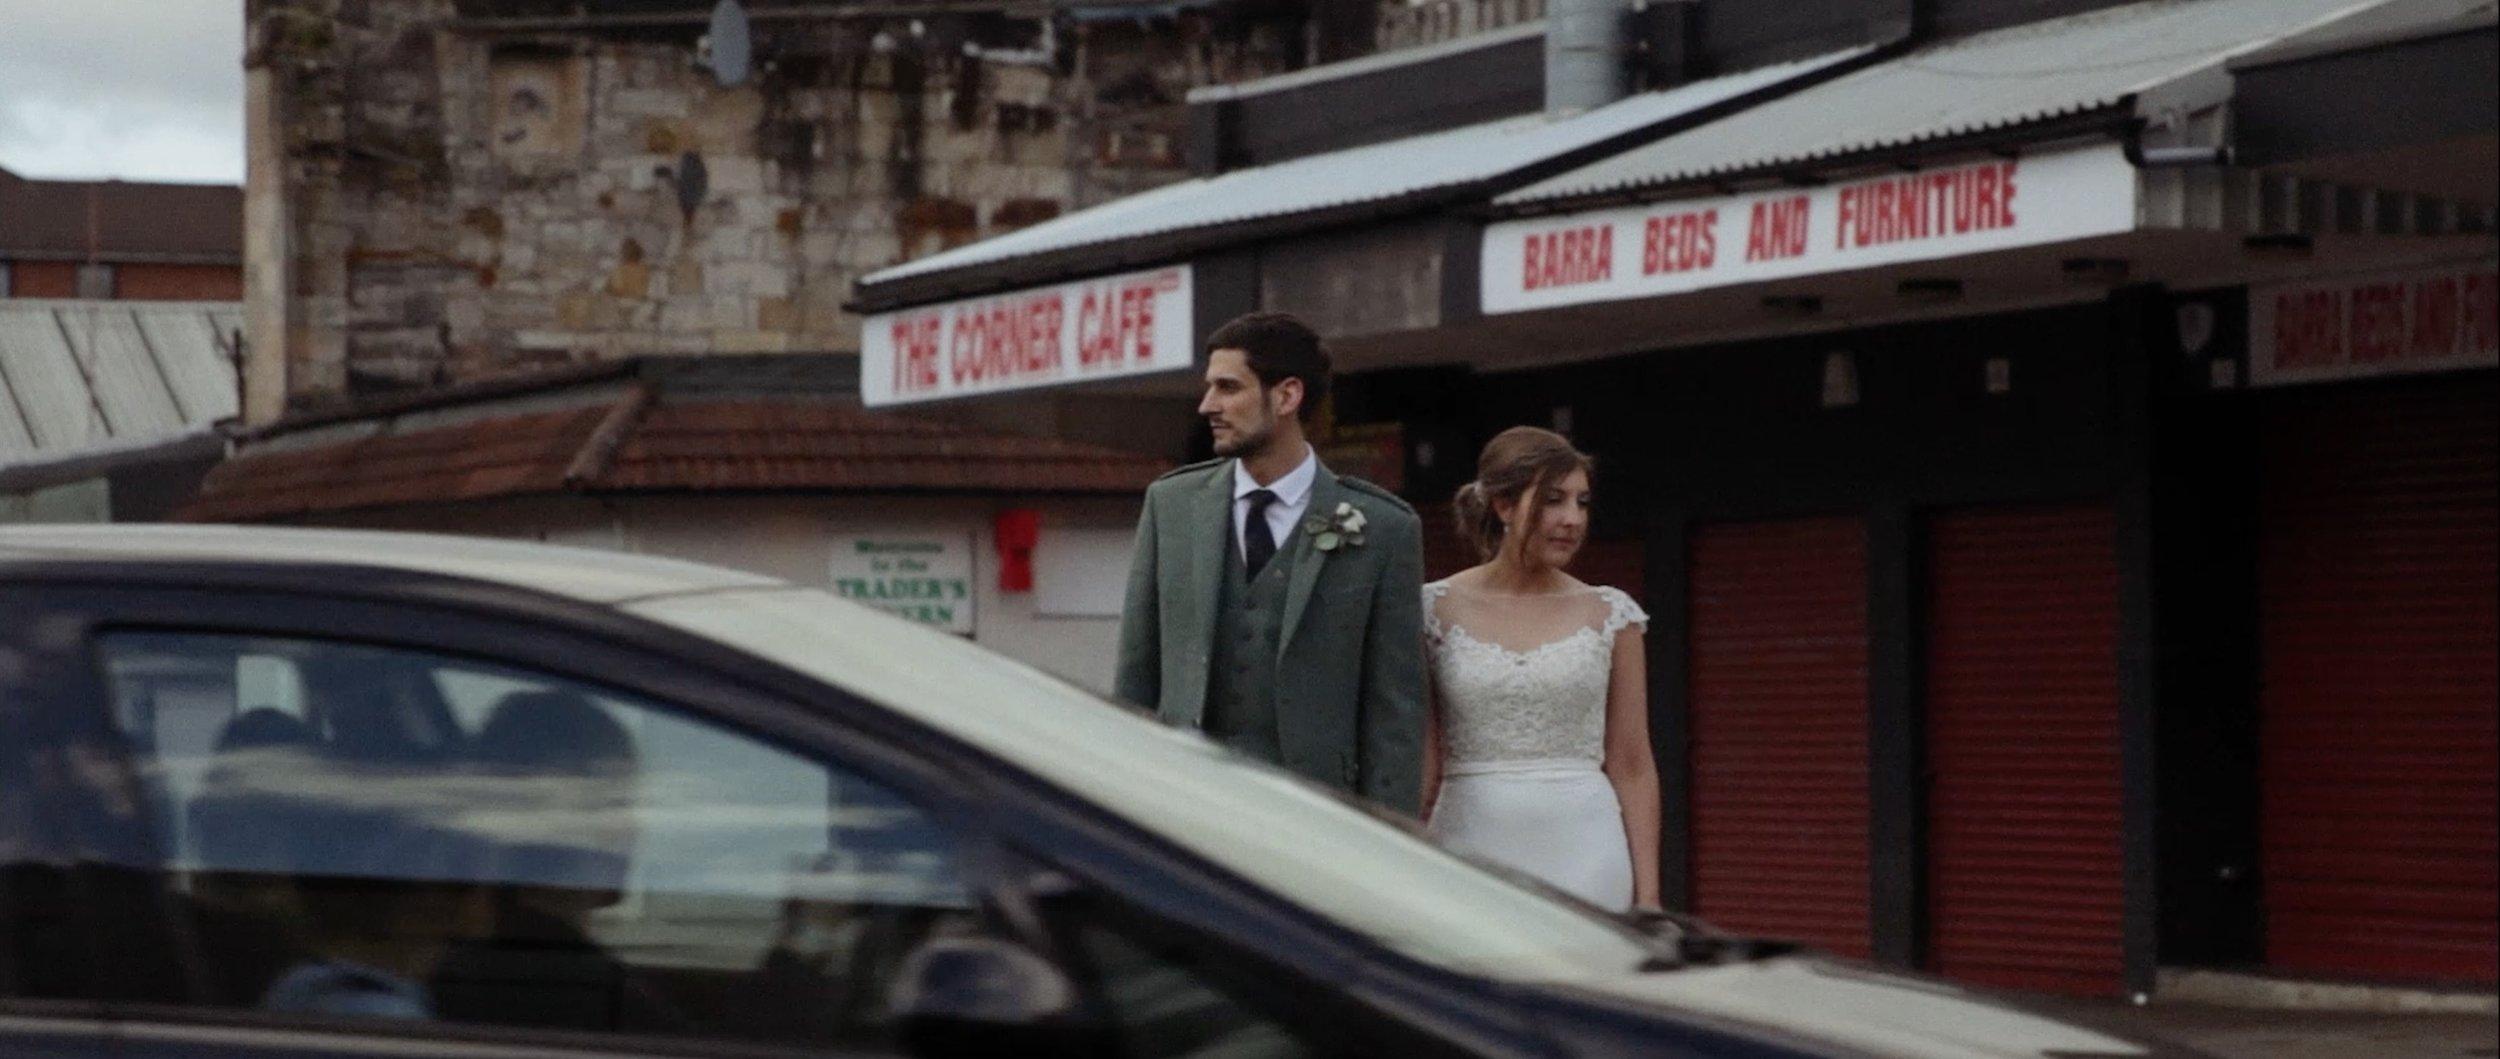 edinburgh-wedding-videographer_LL_05.jpg